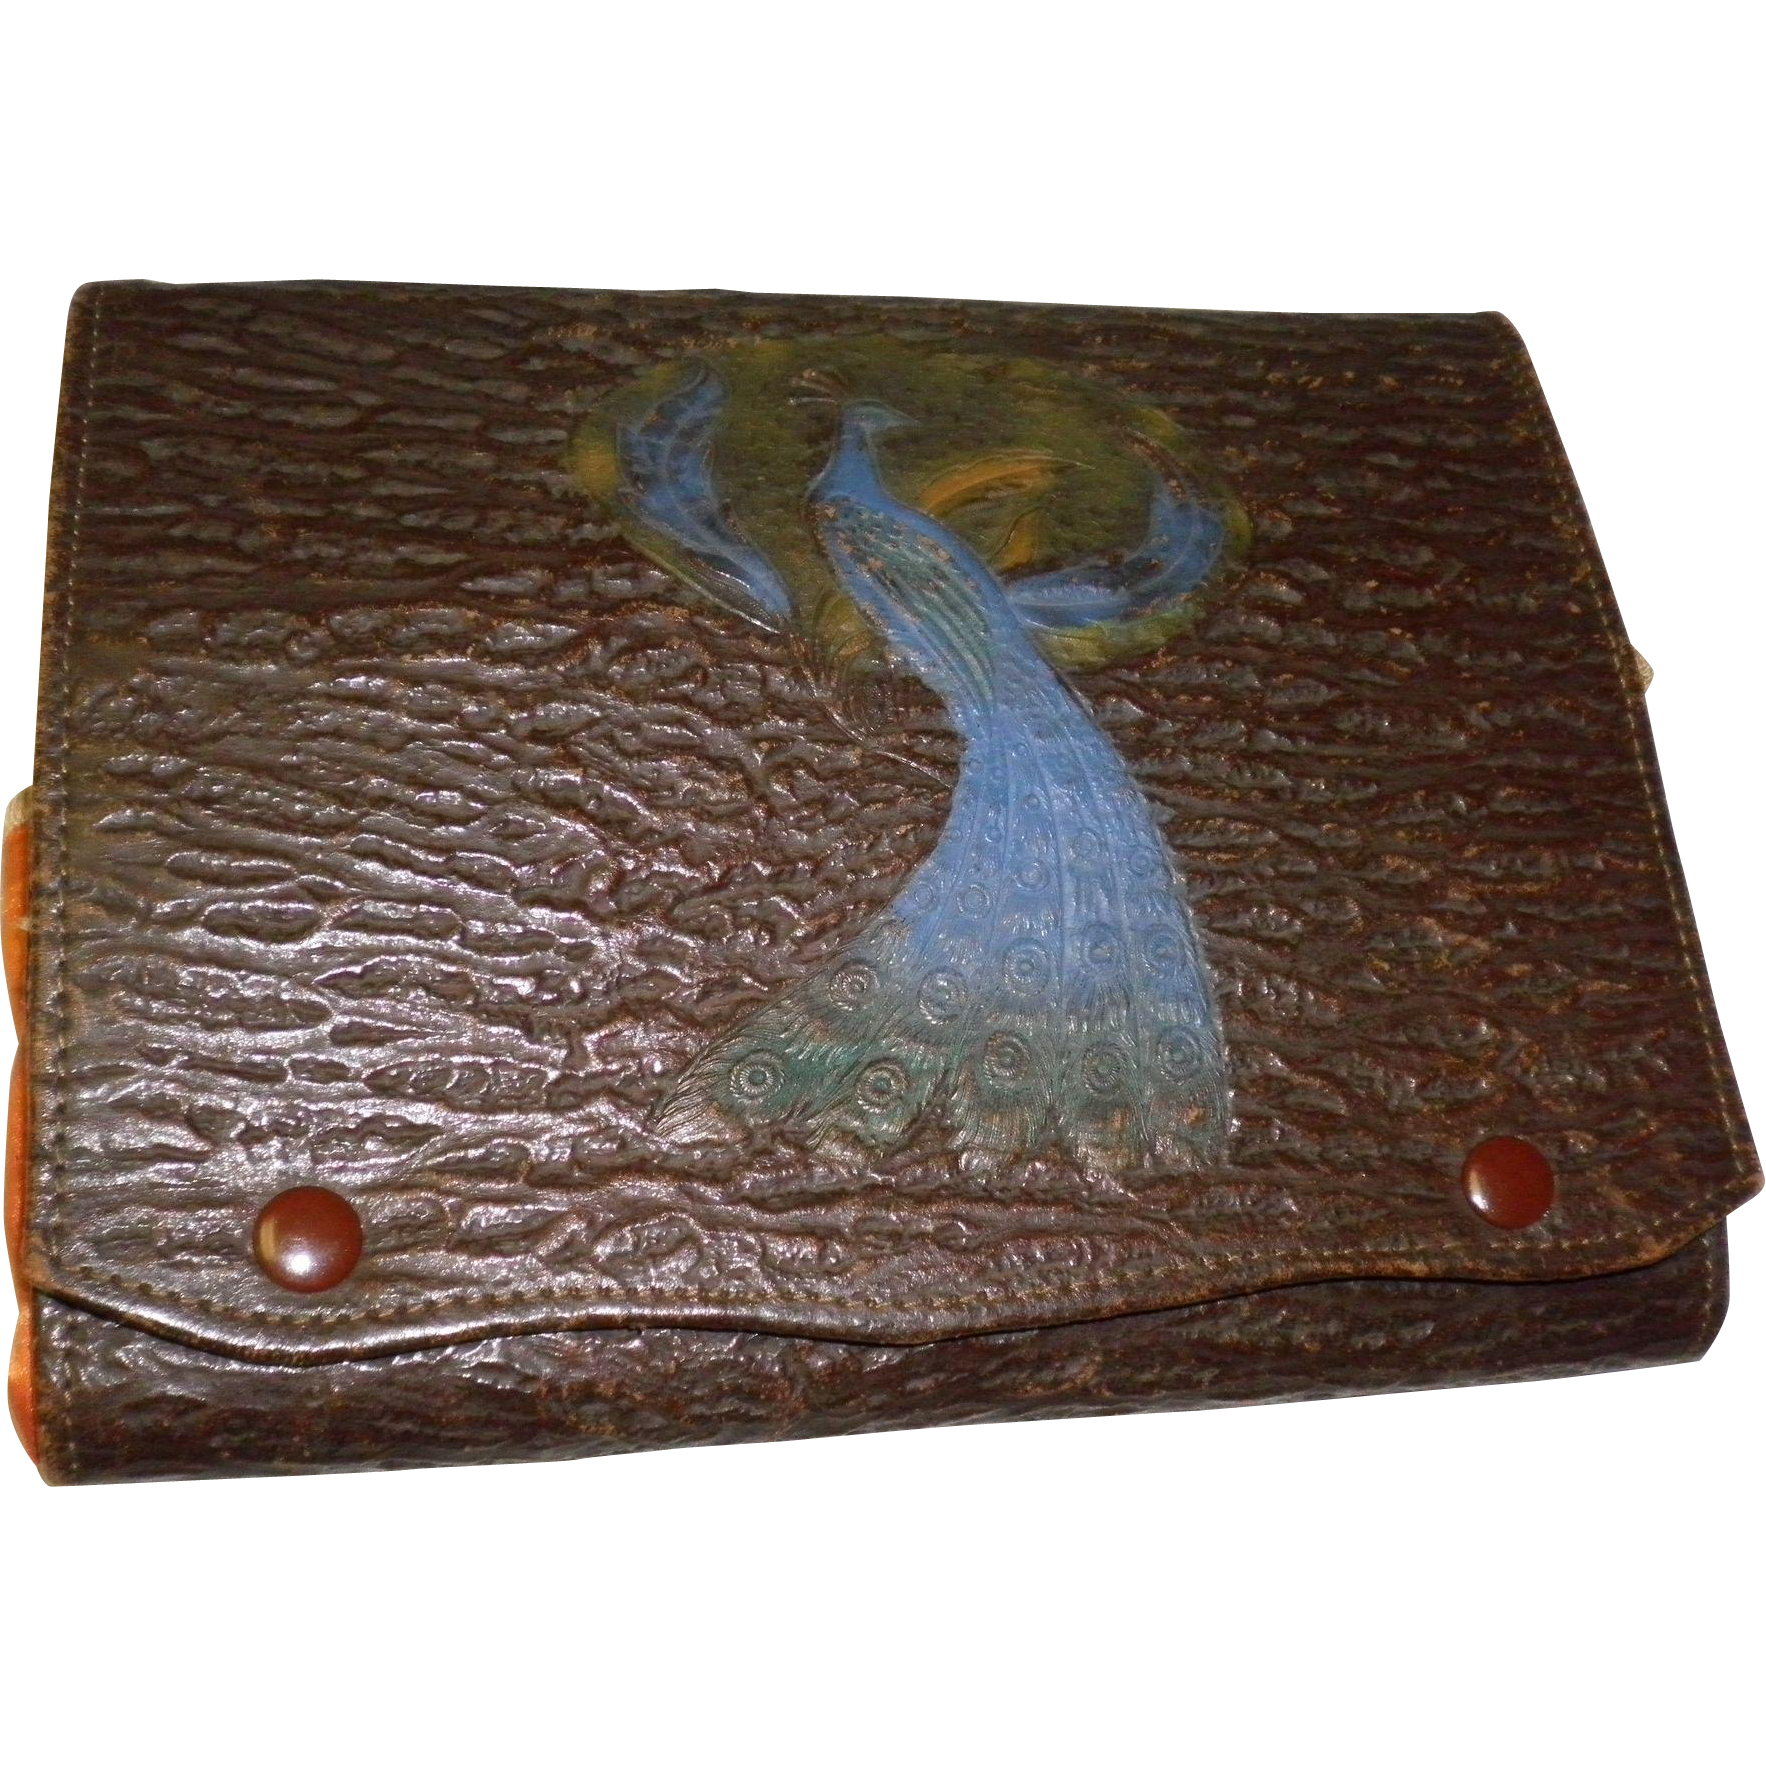 Vintage 14 Piece. Lucite Travel Manicure Set In Leather Case